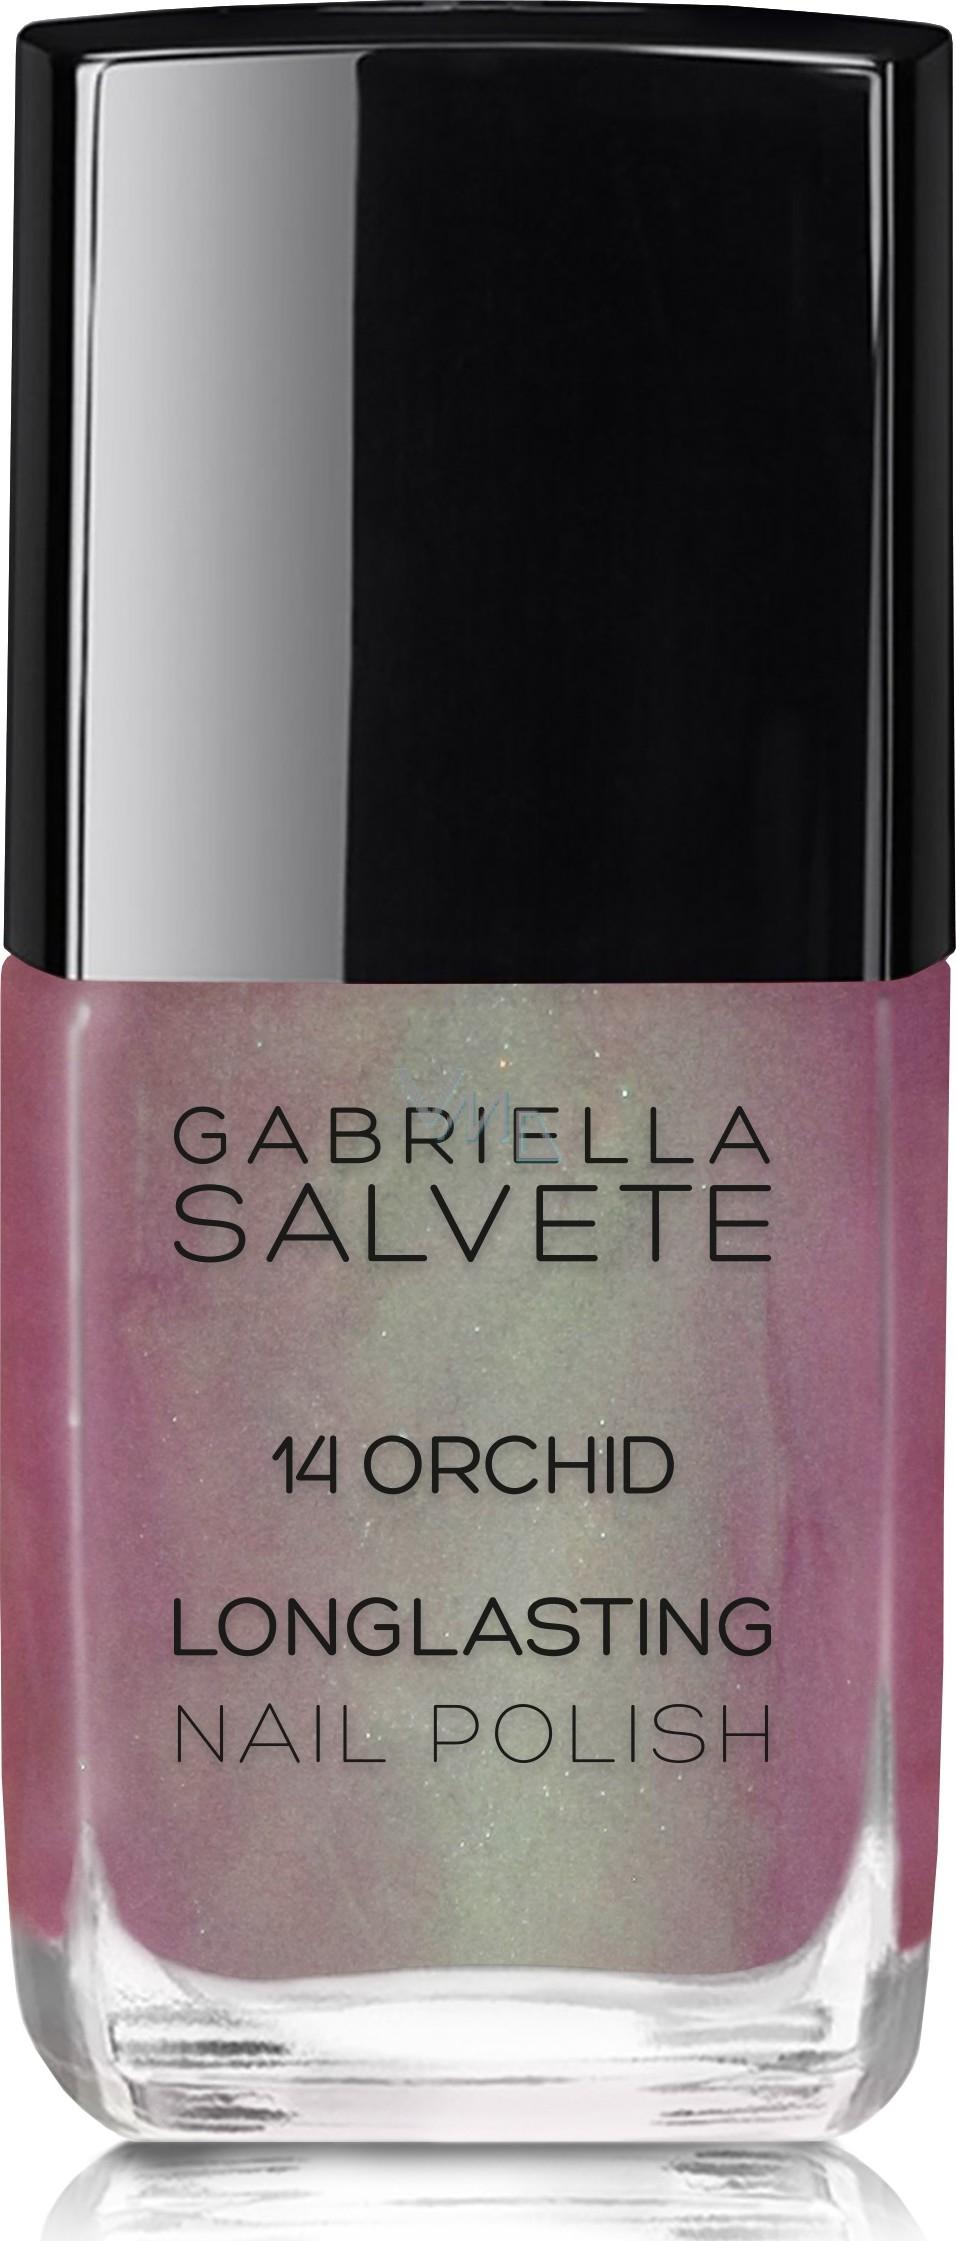 Gabriella Salvete Longlasting Enamel Long Lasting Nail Polish With High Gloss 14 Orchid 11 Ml Vmd Parfumerie Drogerie